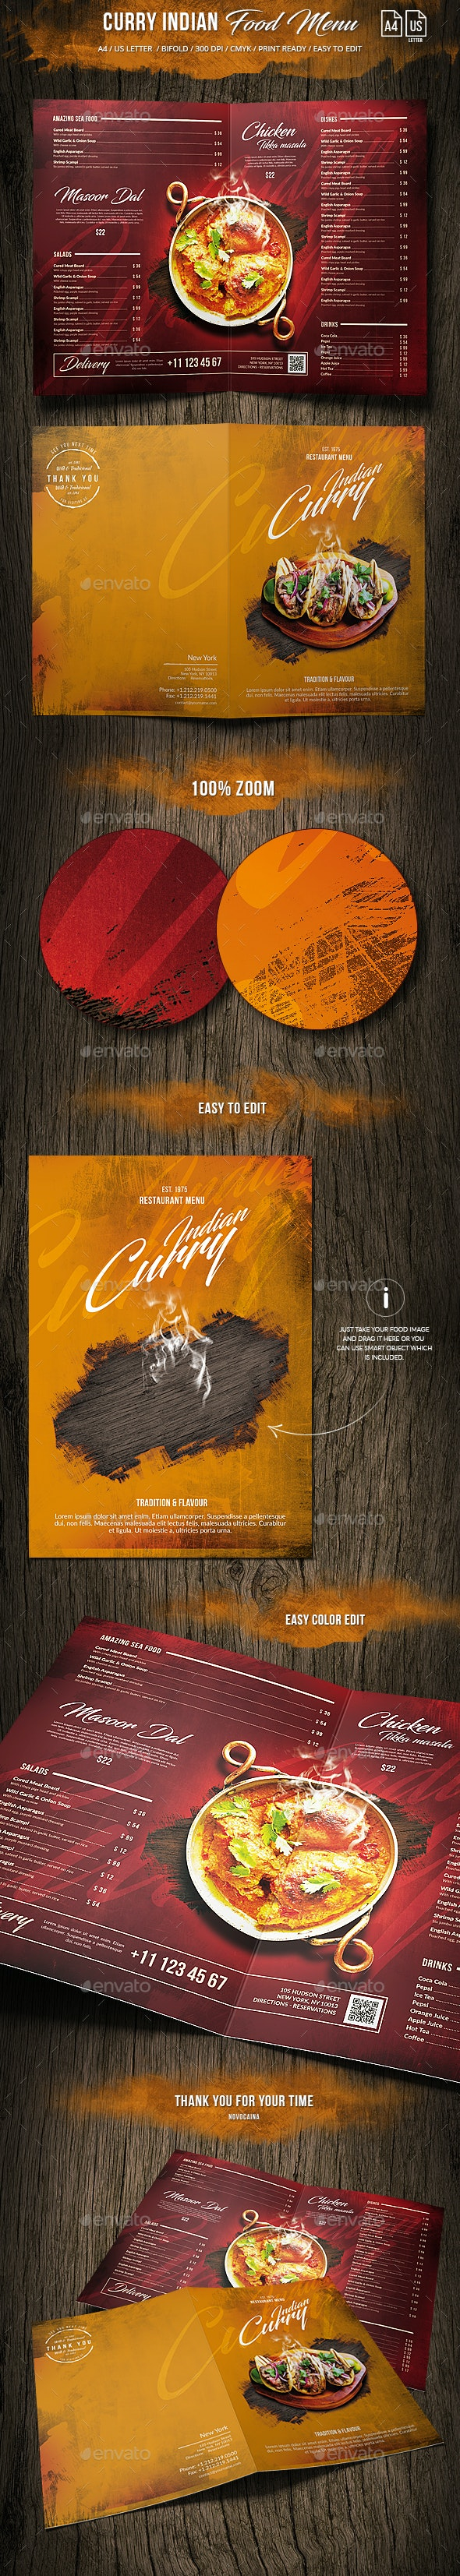 Curry Indian Food Menu - A4 and US Letter Bi-Fold - Food Menus Print Templates